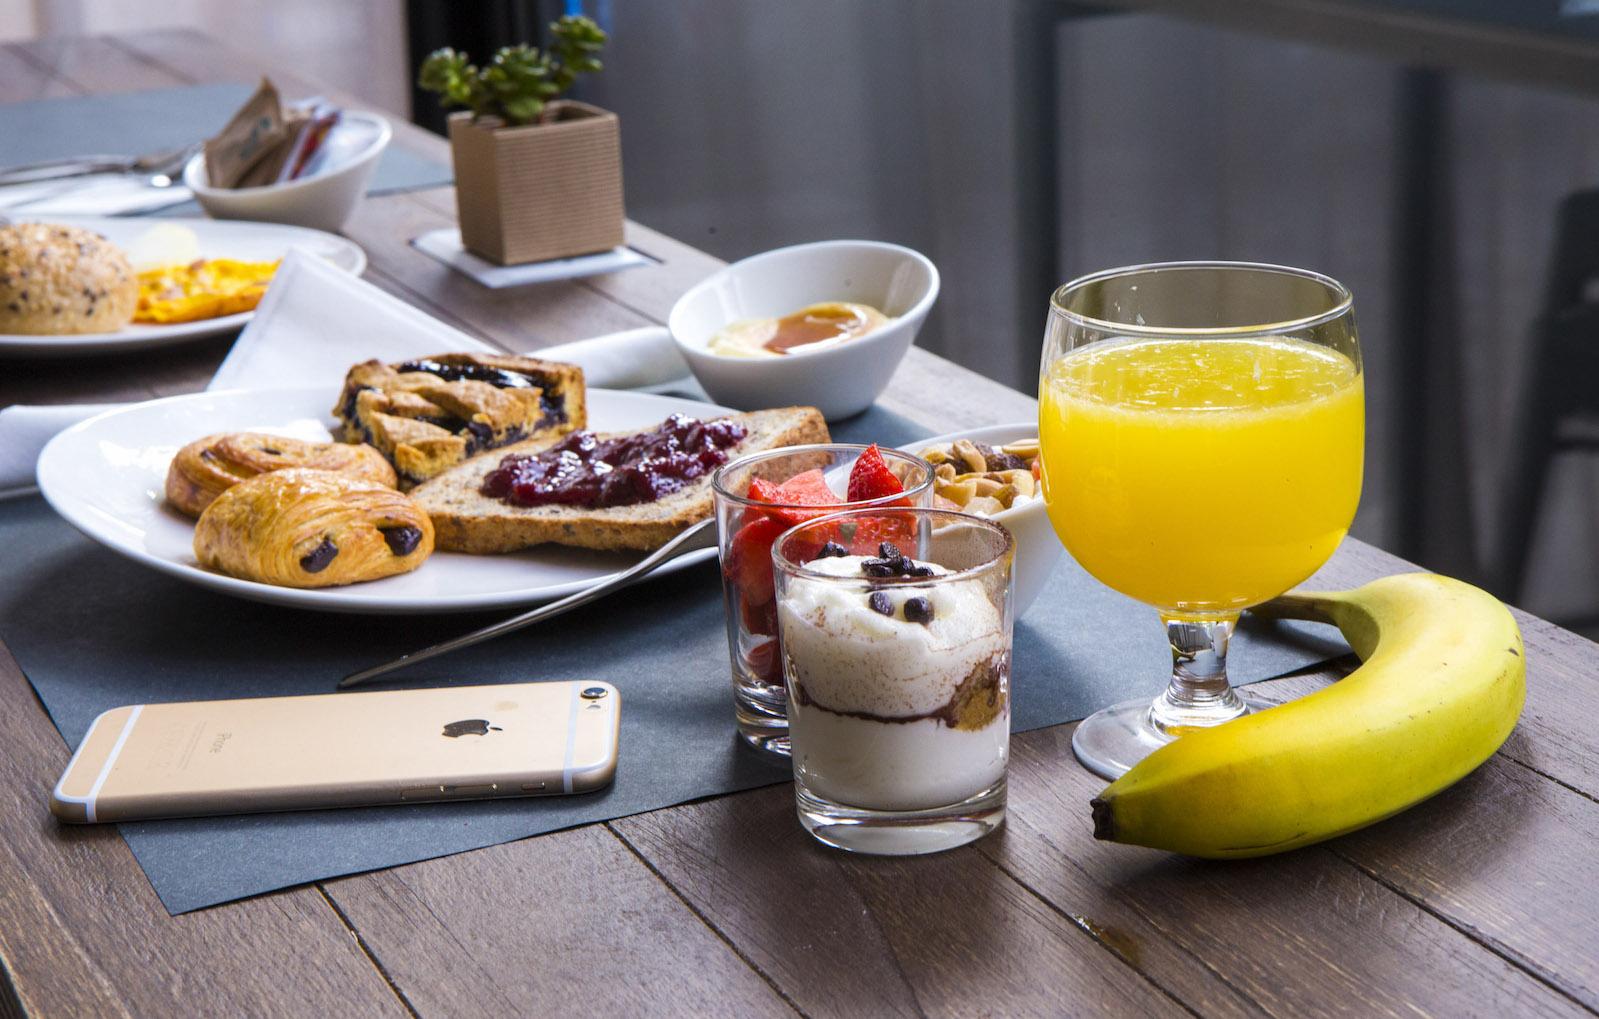 breakfast-xxl-dettaglio